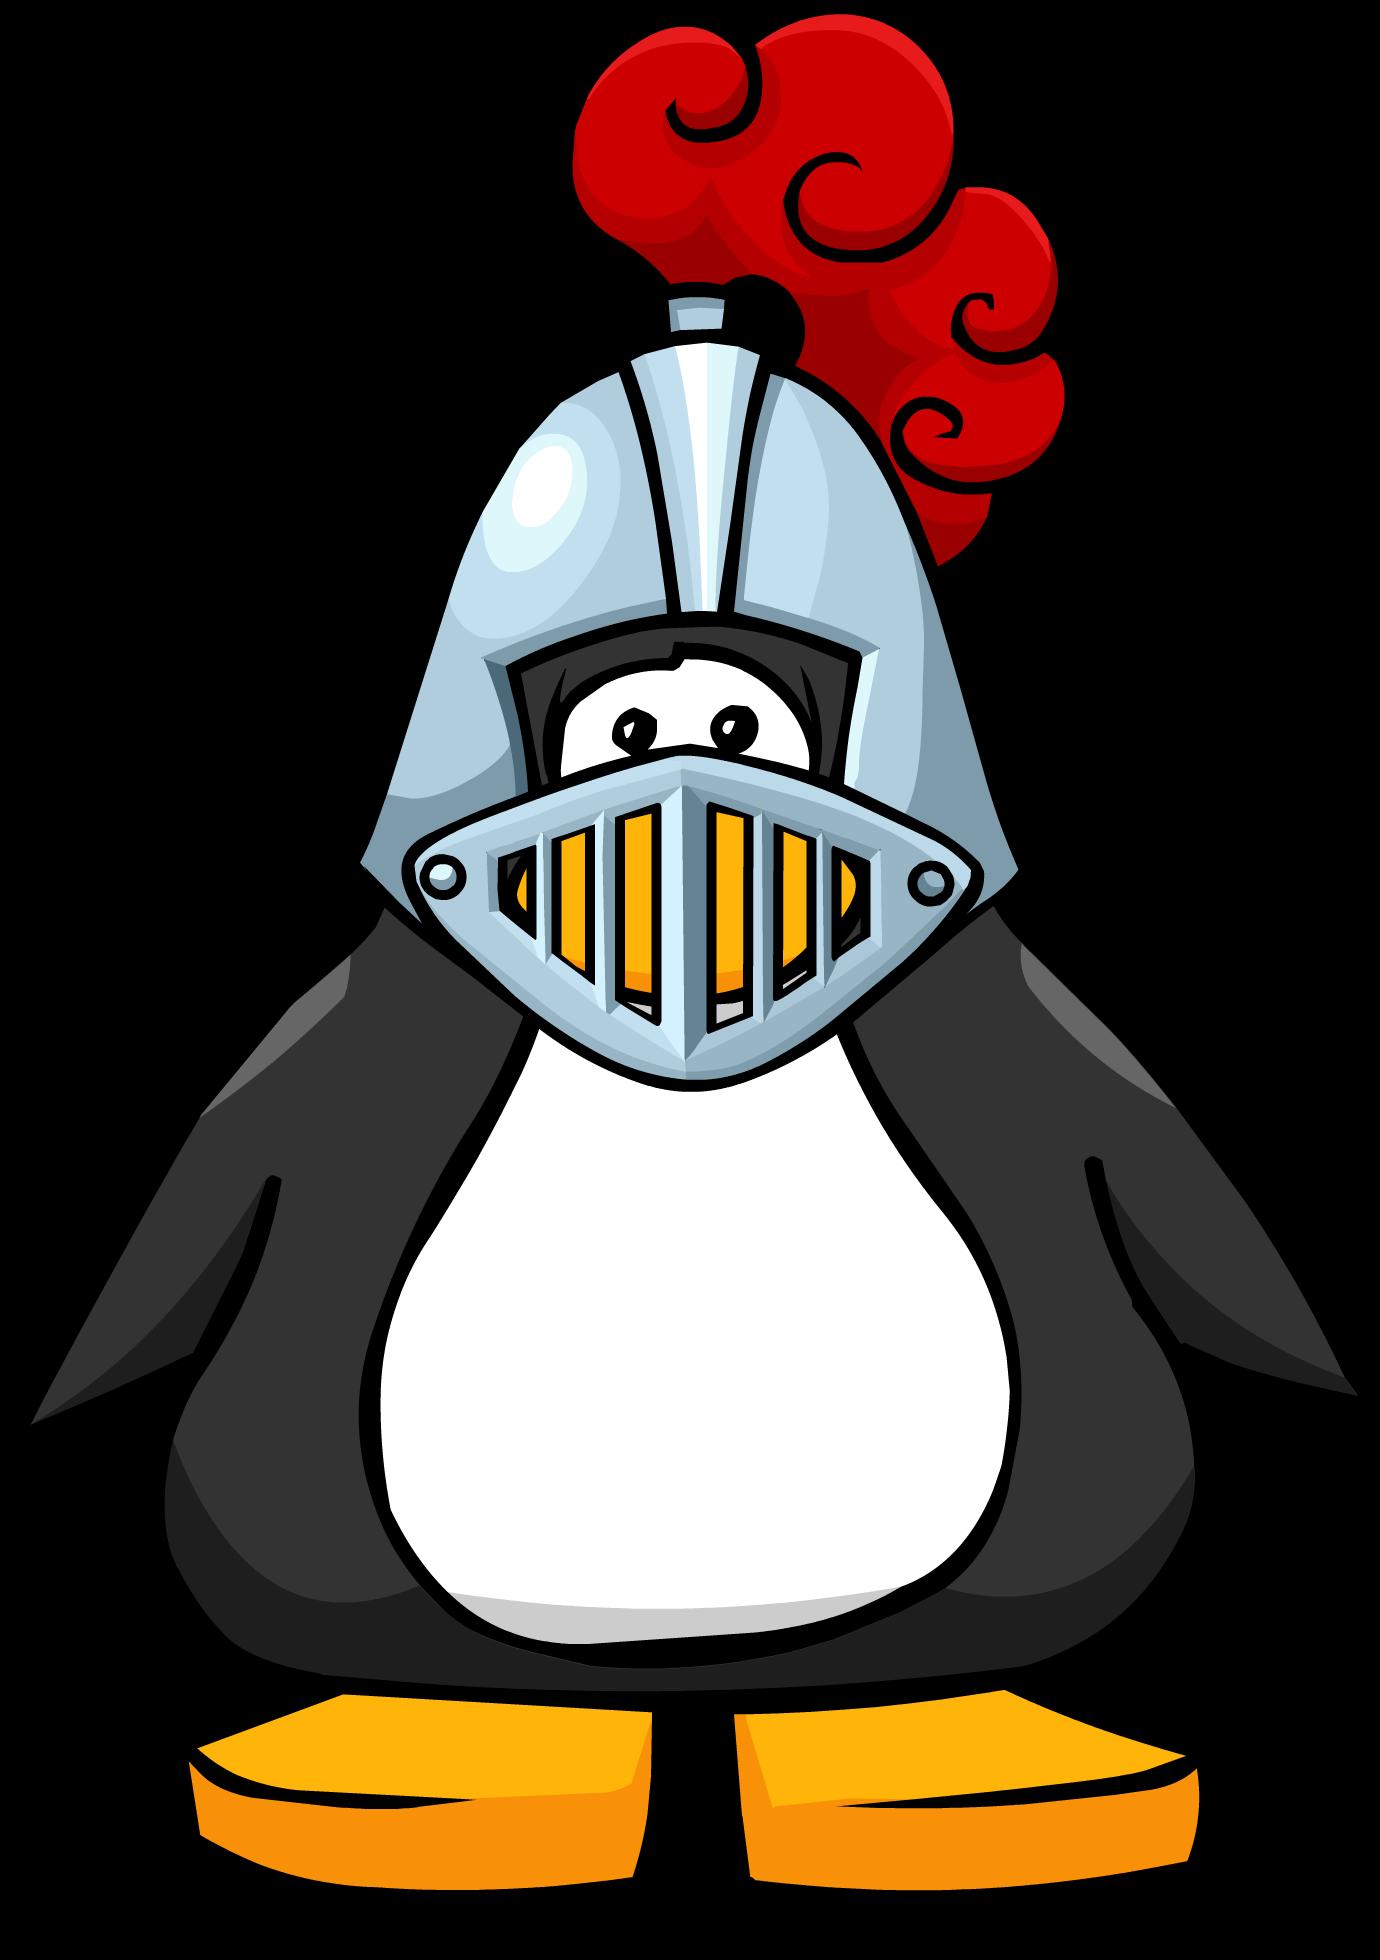 knight clipart knight hat